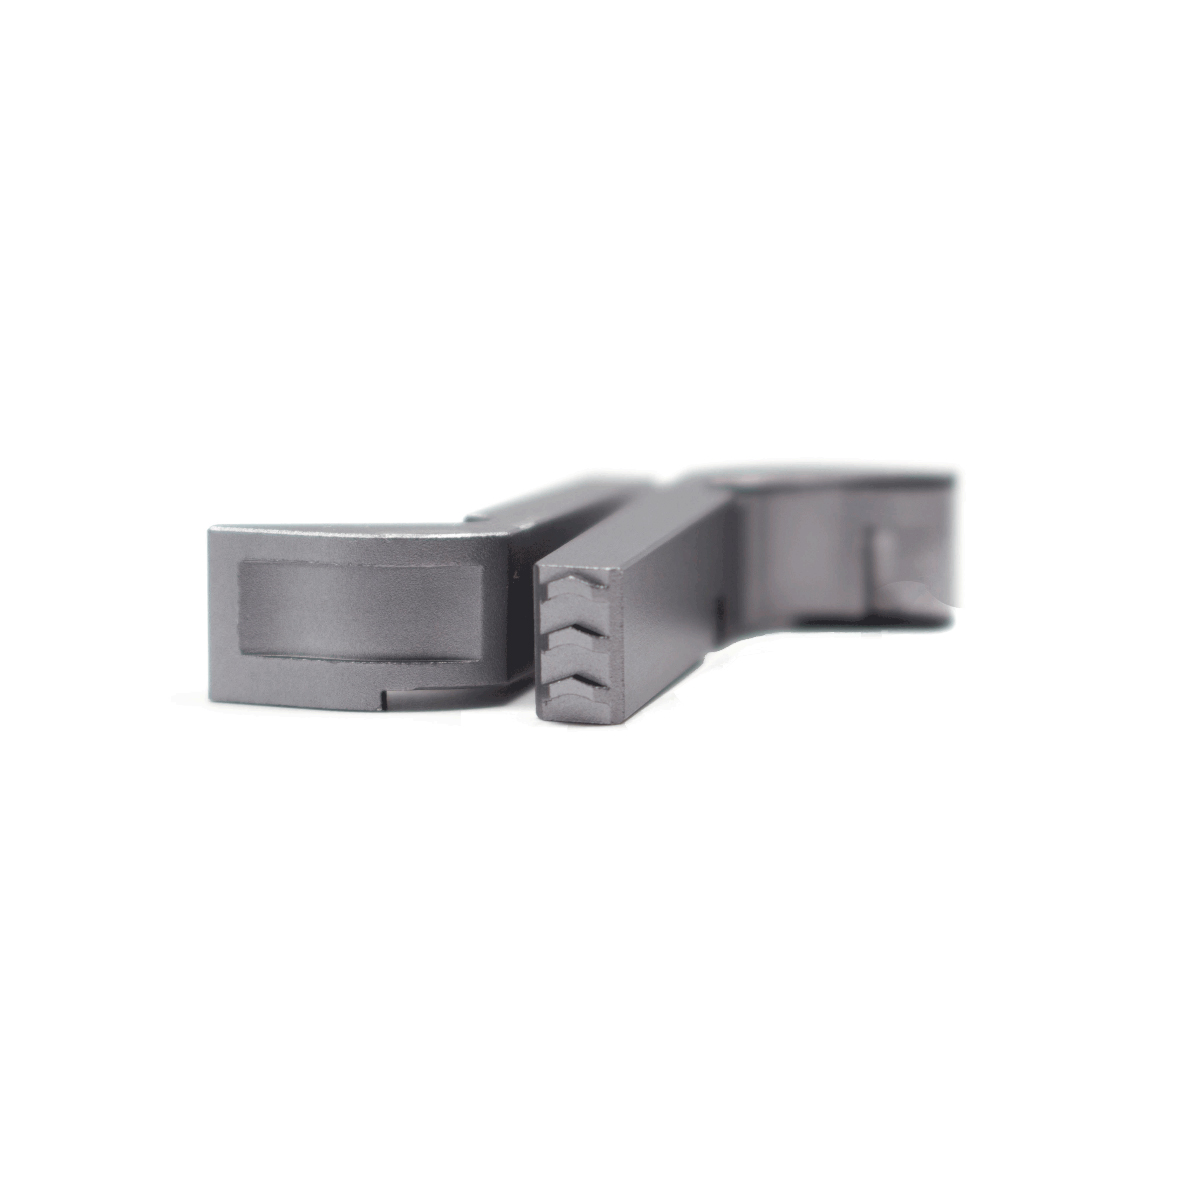 Ambi CNC Extended Double Side Magazine Release Button Gen 3 Aluminum Alloy